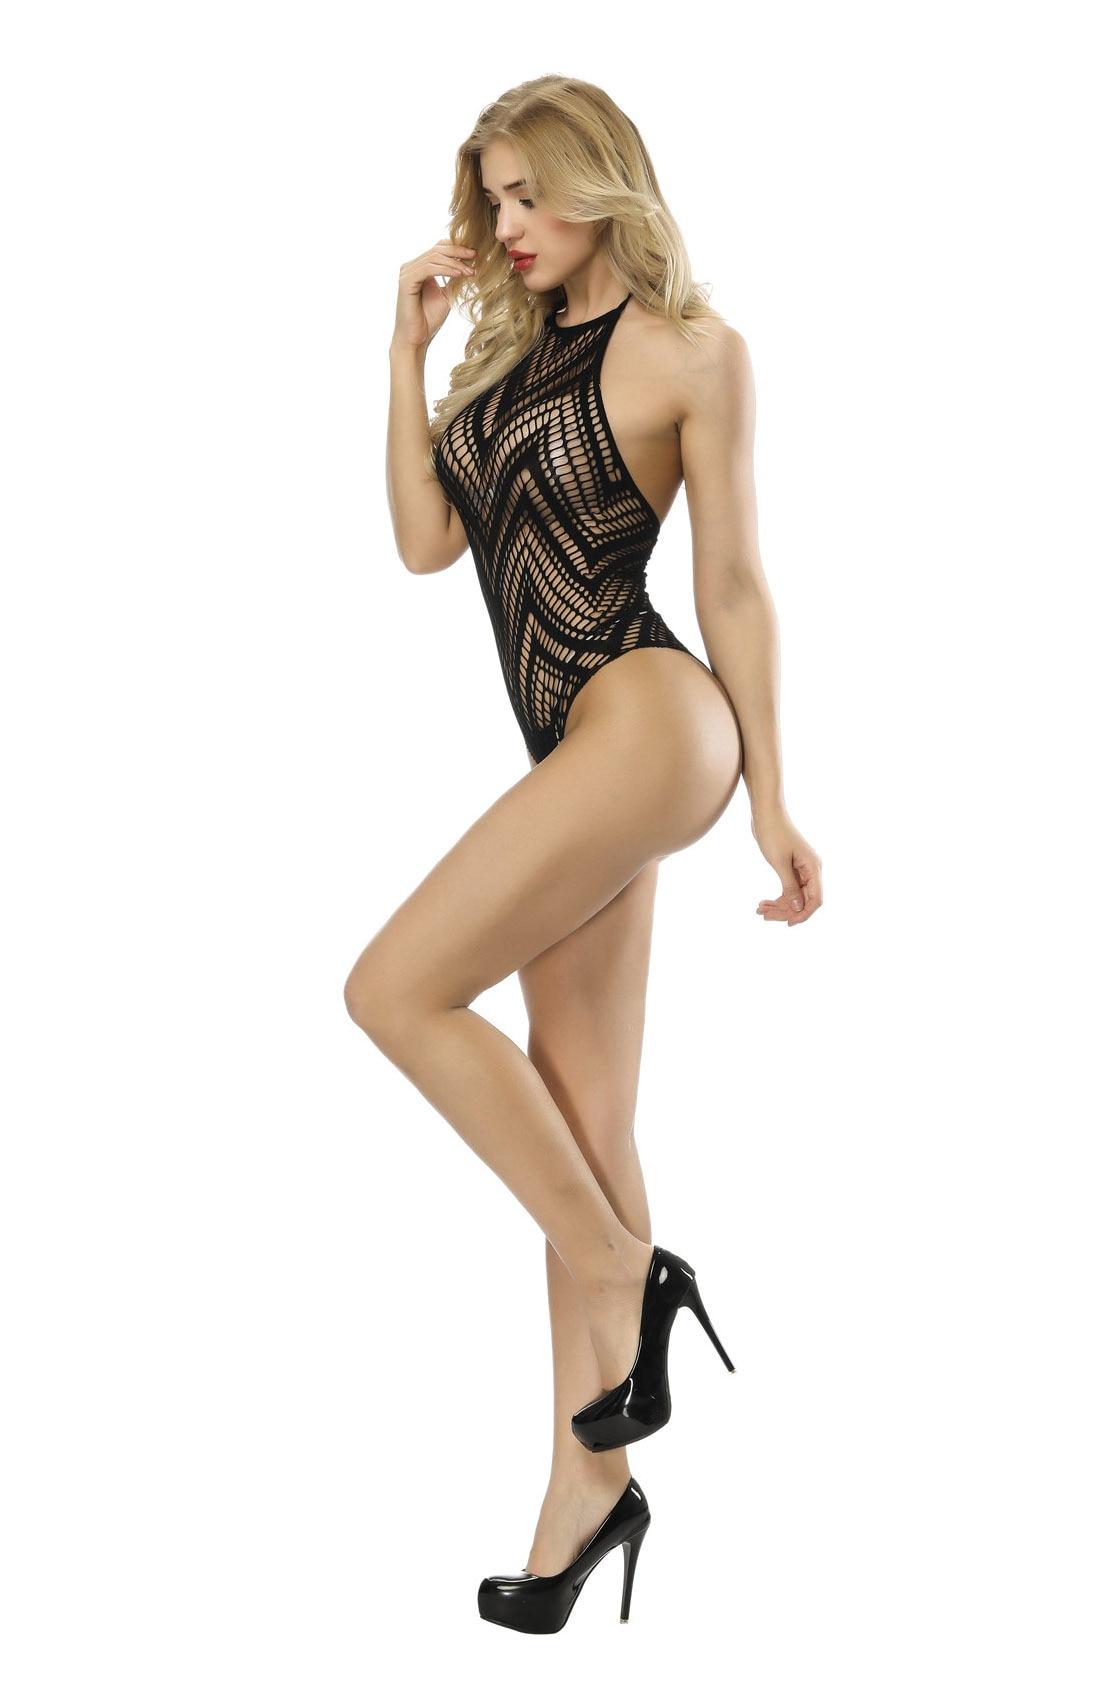 H4906ee45929b46108853e08dd0cbd9feB Sexy Women Baby Dolls Exotic Teddies Bodysuits Sexy Lingerie Bodystocking Sex Costumes Nightwear Intimates Backless Underwear